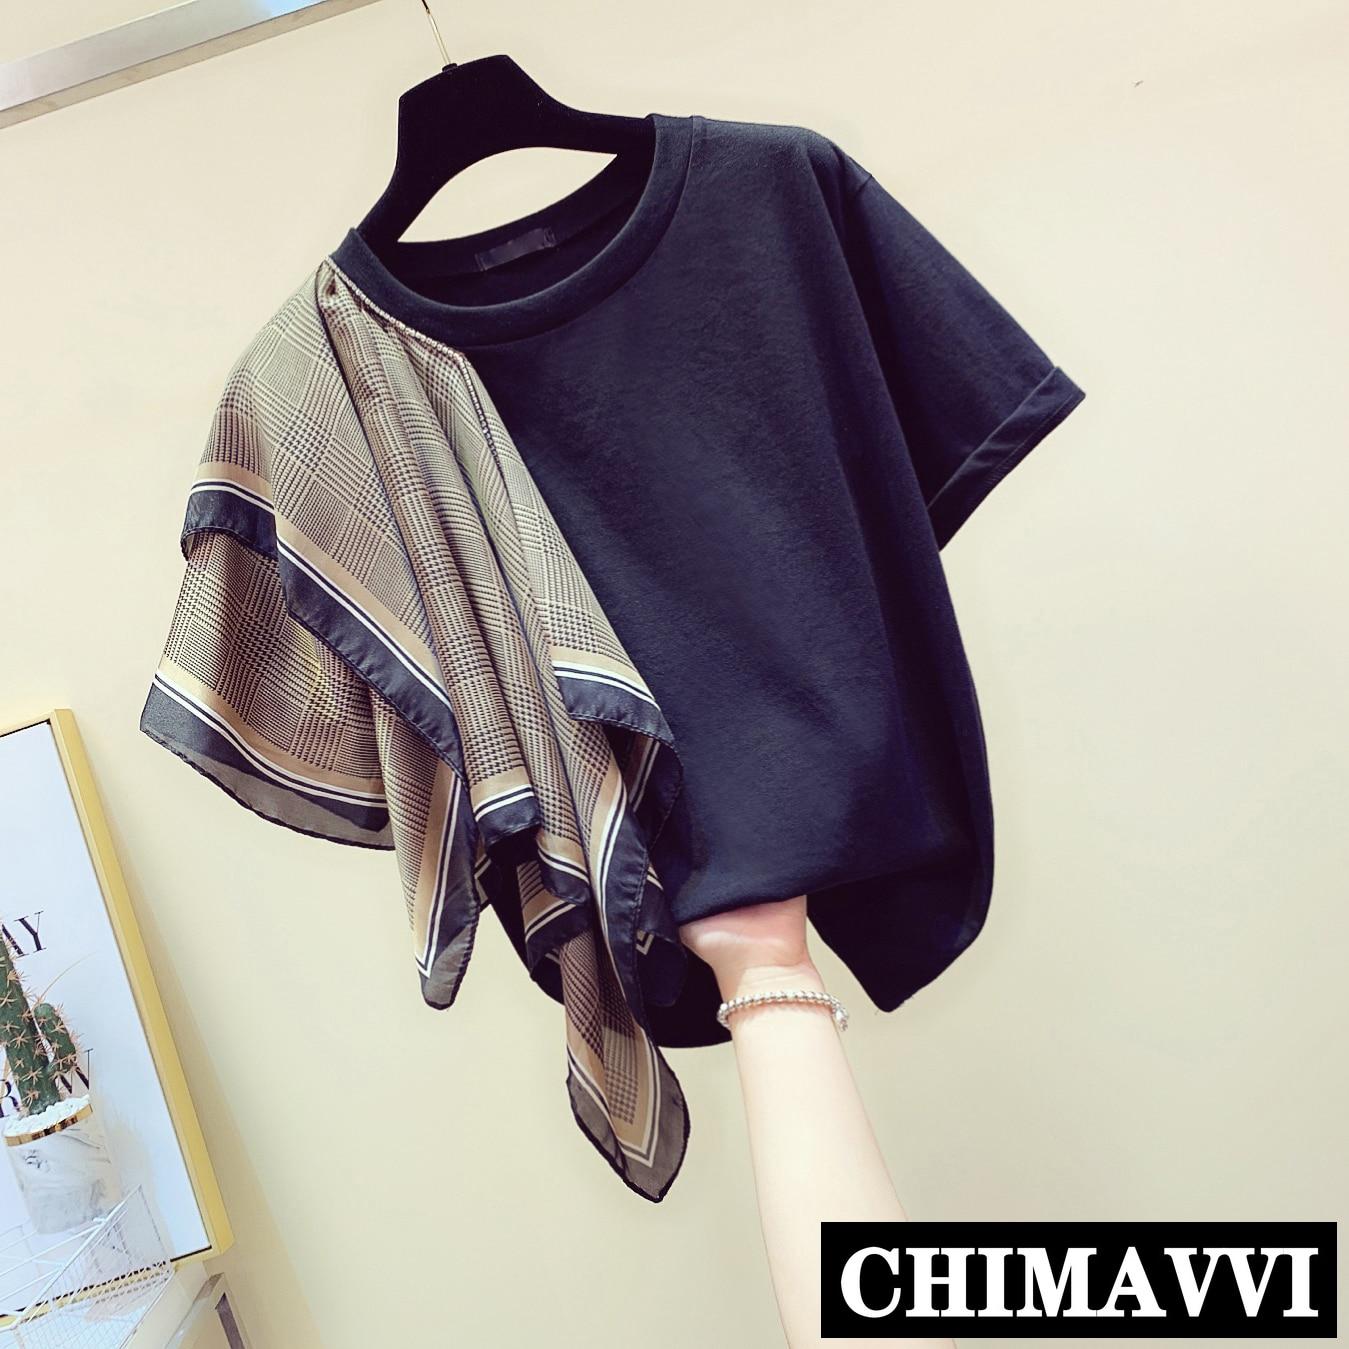 Camiseta de verano Retro para mujer, camiseta negra con cuello redondo, bufanda Irregular, camisa holgada de manga corta, camisetas casuales para chicas